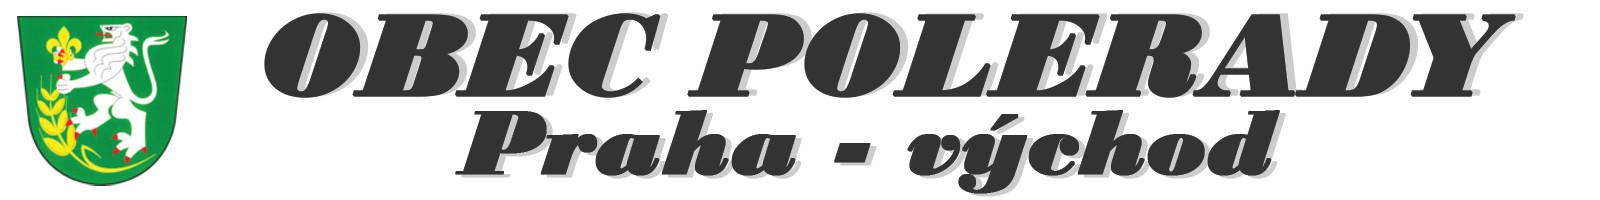 Obec Polerady u Prahy